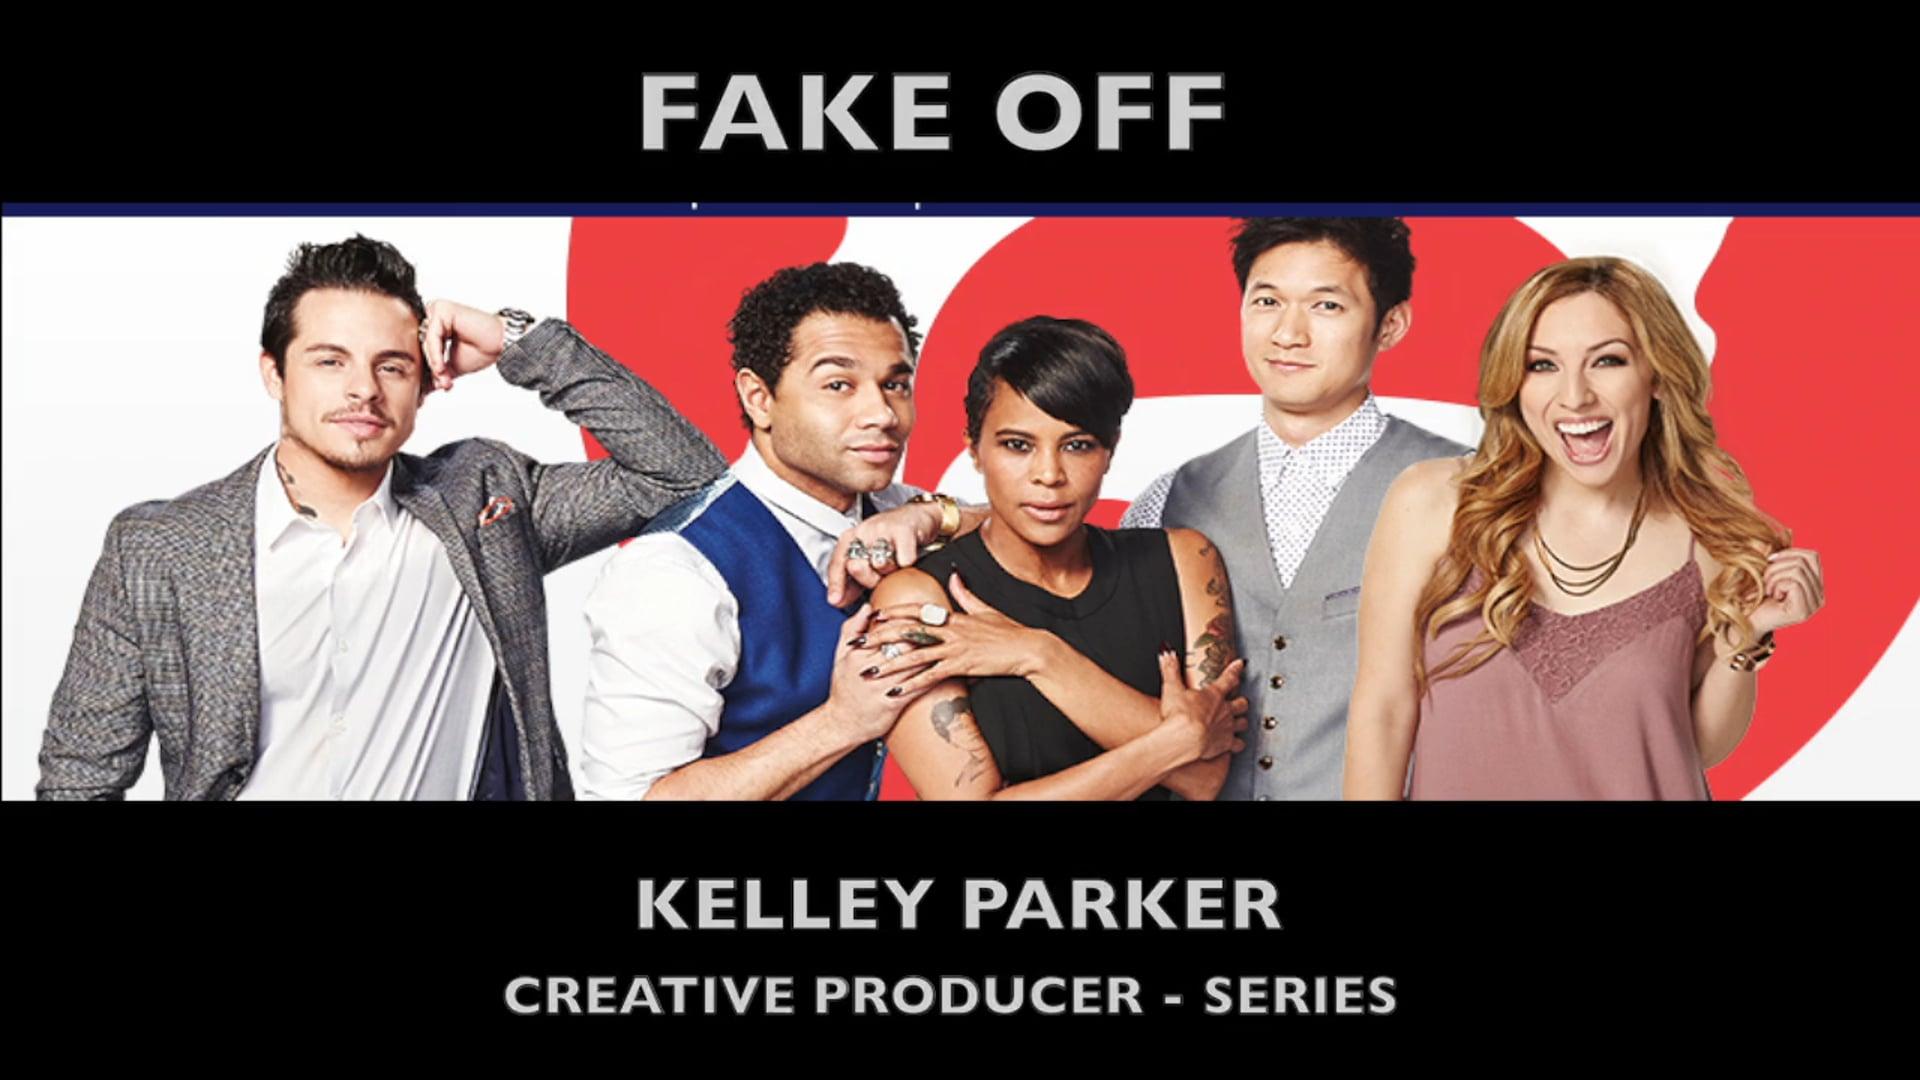 Kelley Parker Fake Off Season 2